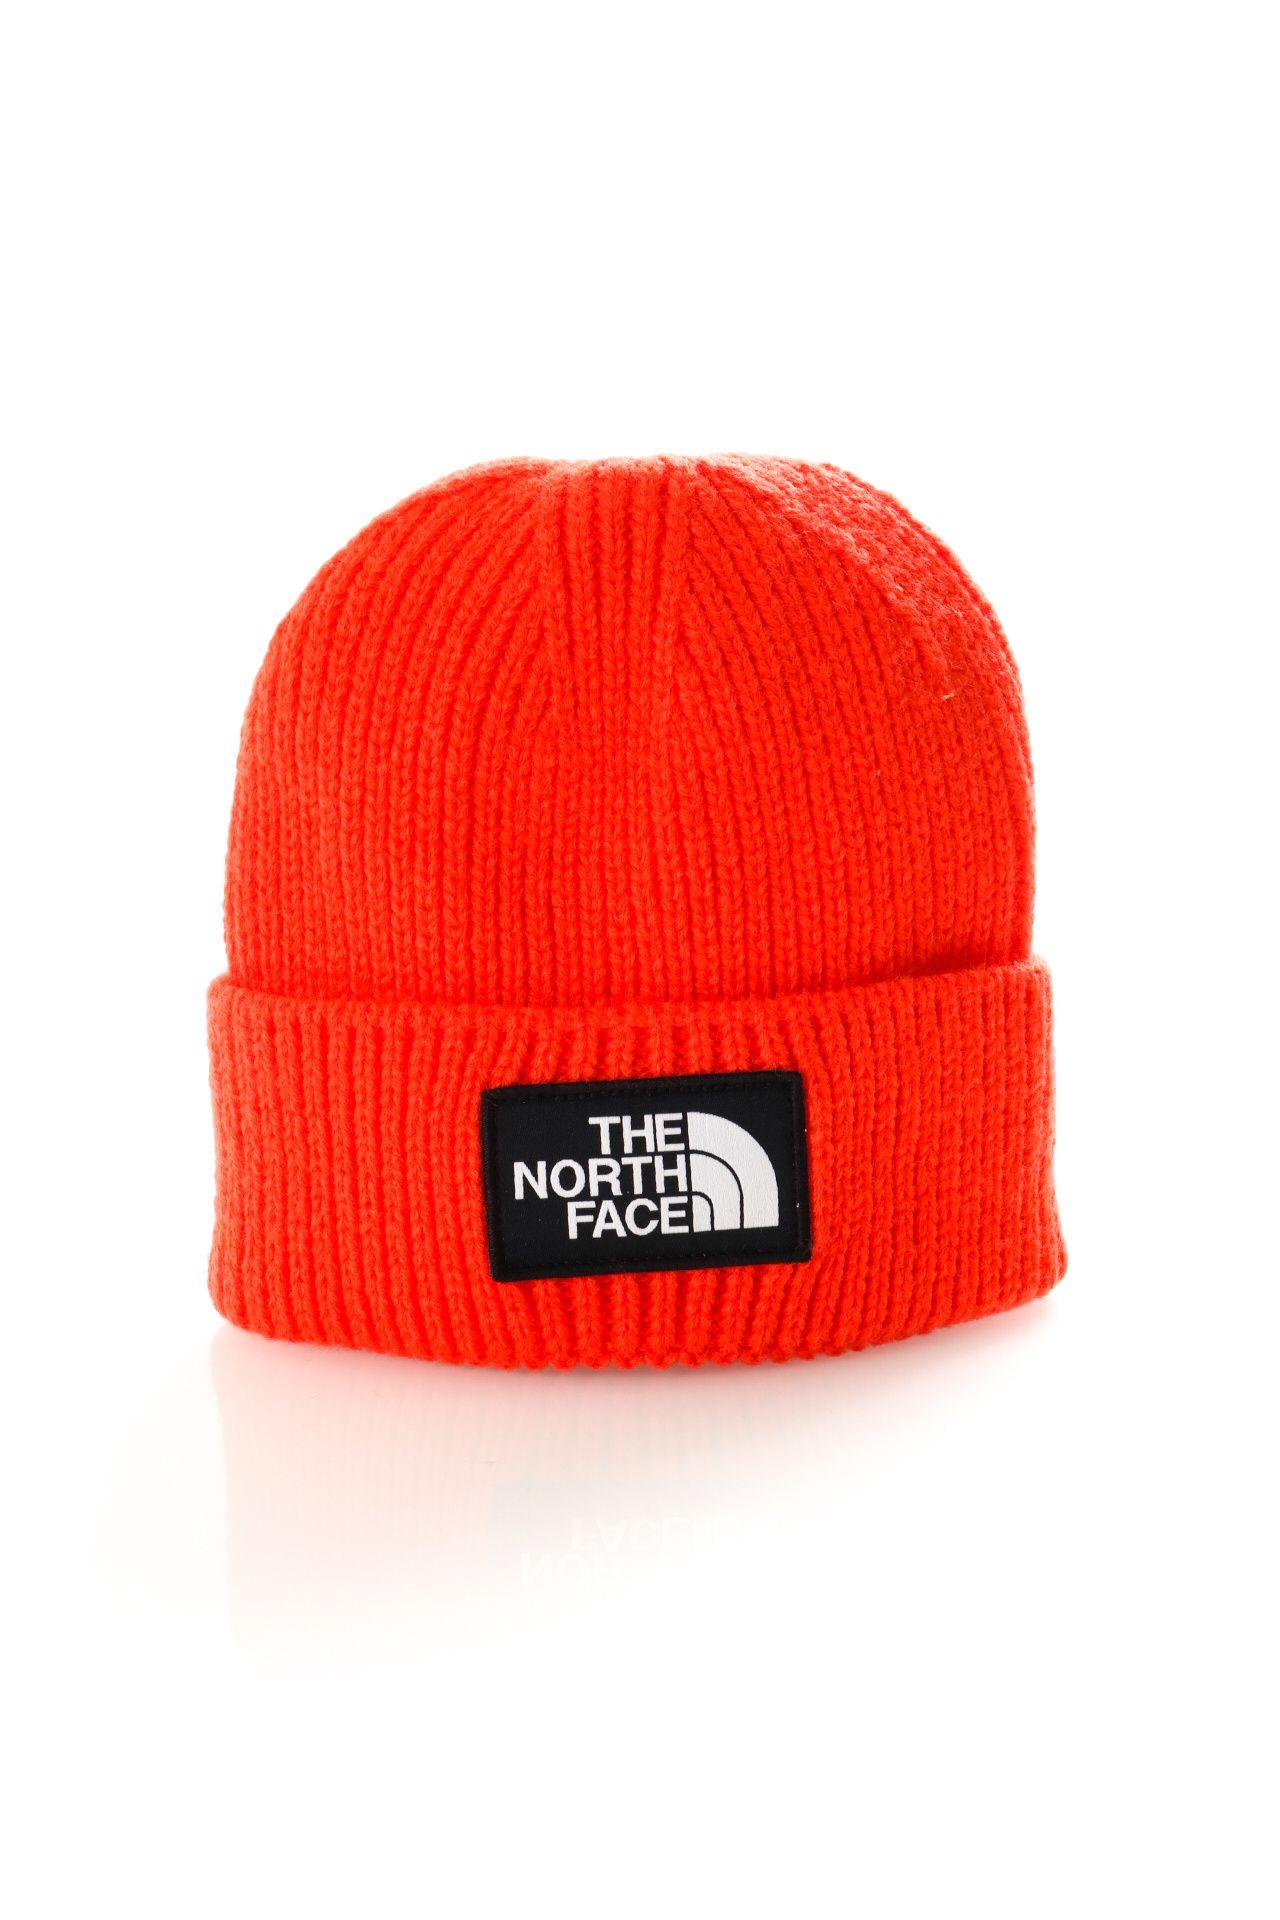 Afbeelding van The North Face Beanie TNF Logo Box Cuffed Beanie Flare NF0A3FJXR151